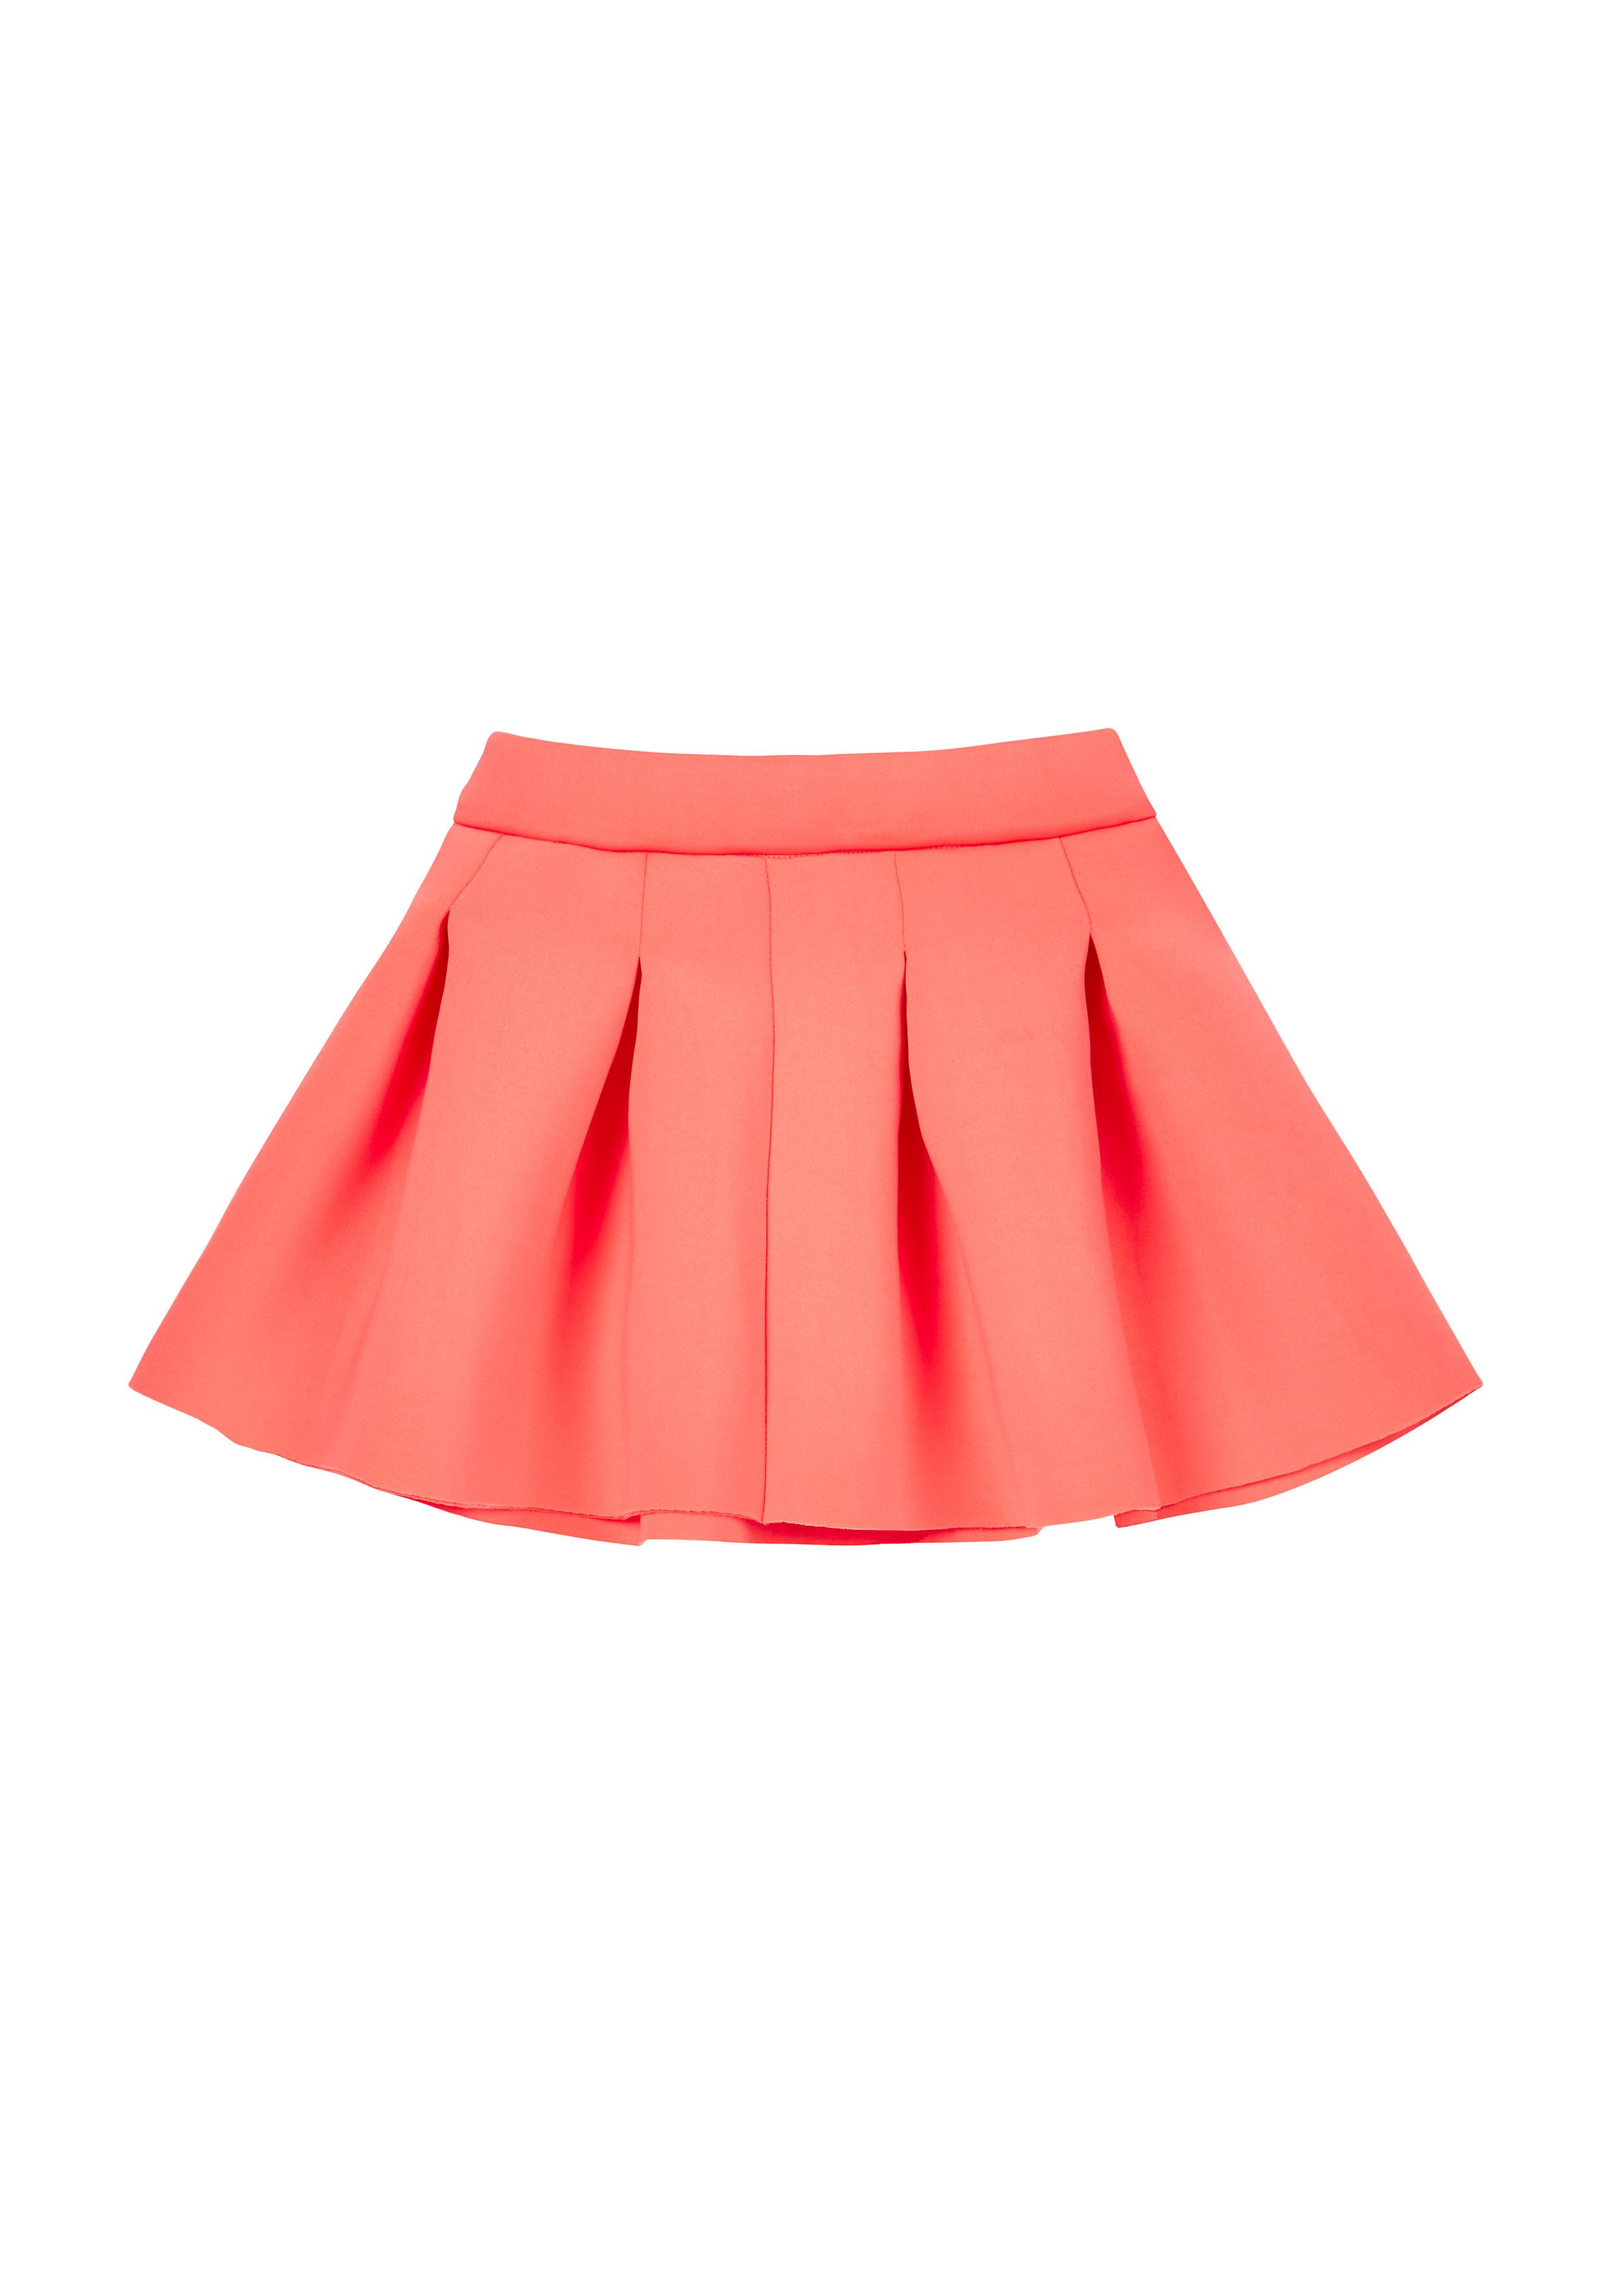 Mothercare | Girls Scuba Skirt